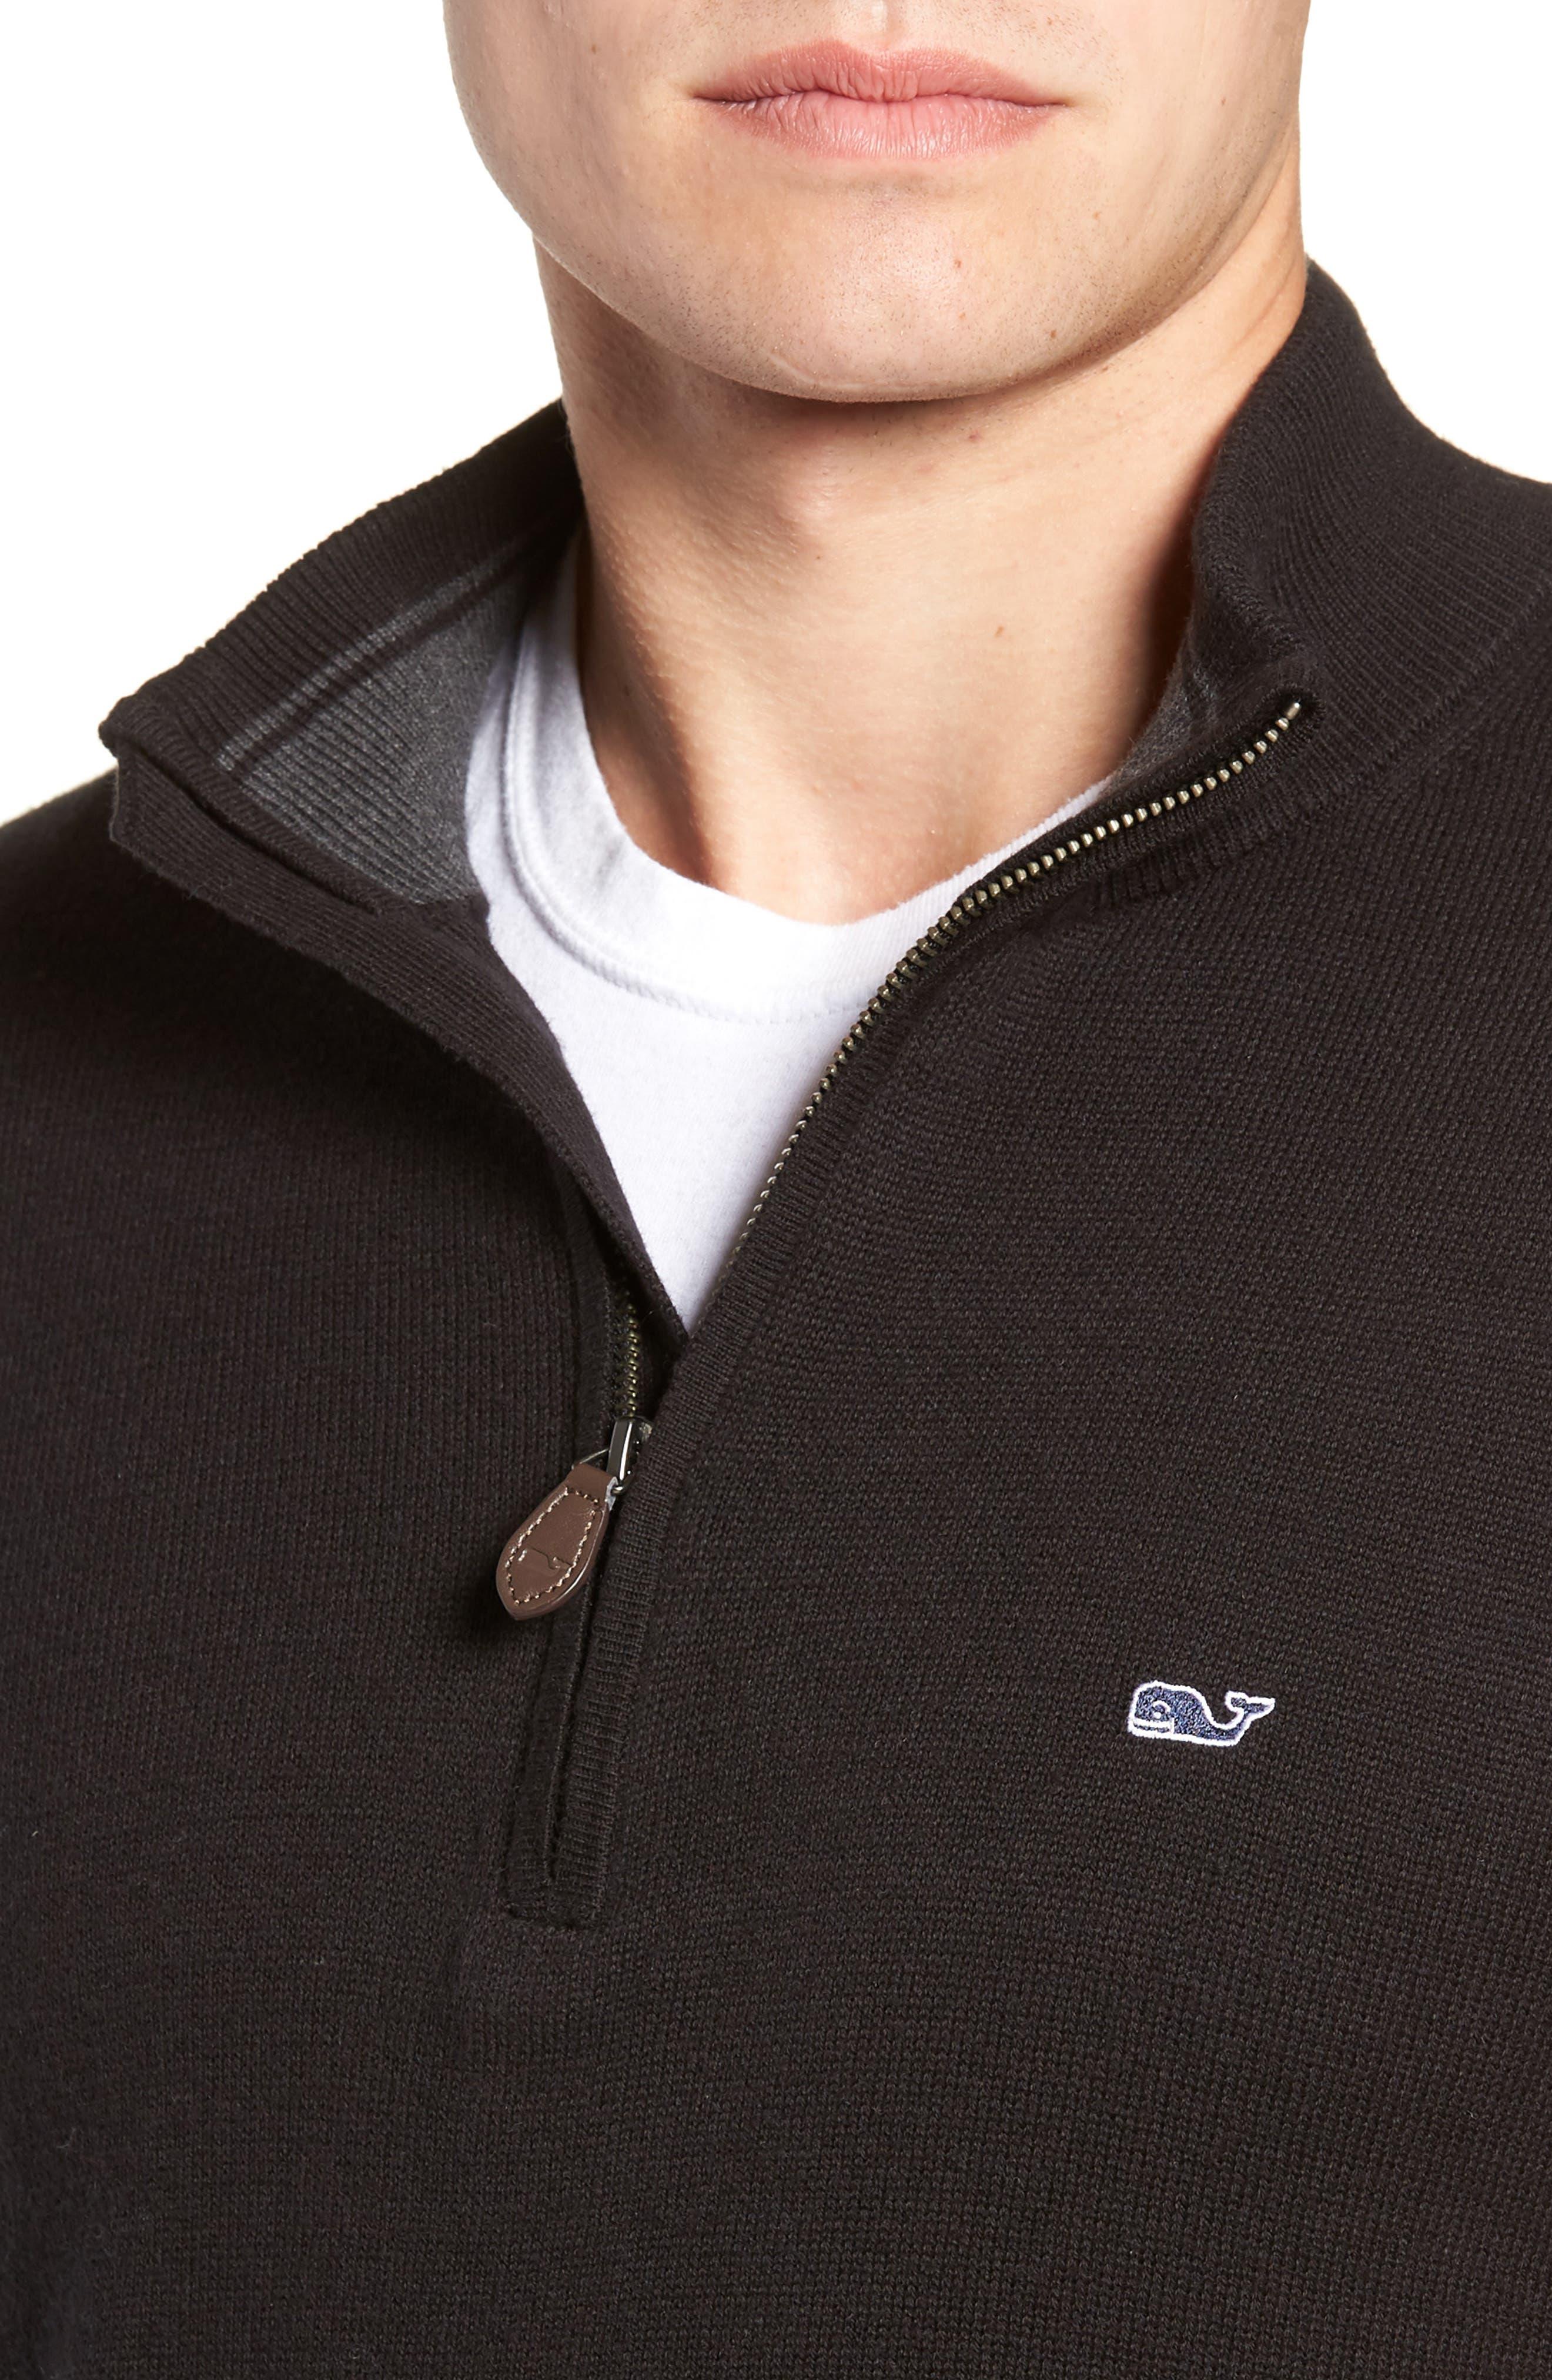 Palm Beach Quarter-Zip Sweater,                             Alternate thumbnail 4, color,                             JET BLACK